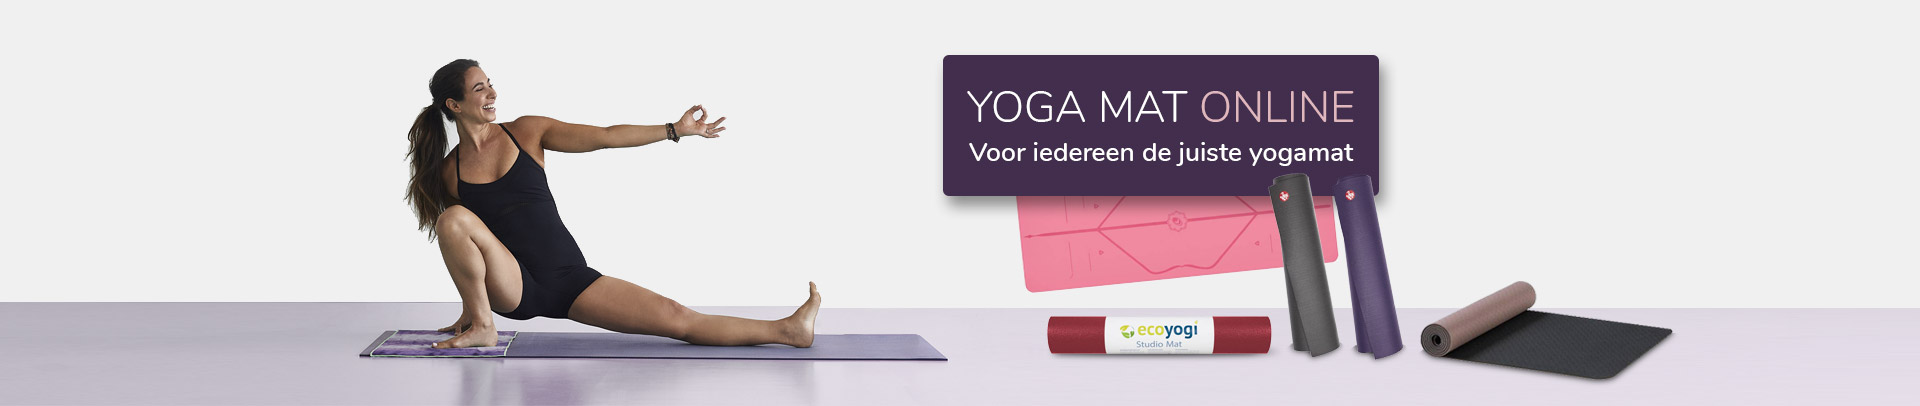 Yogamat Online banner 2